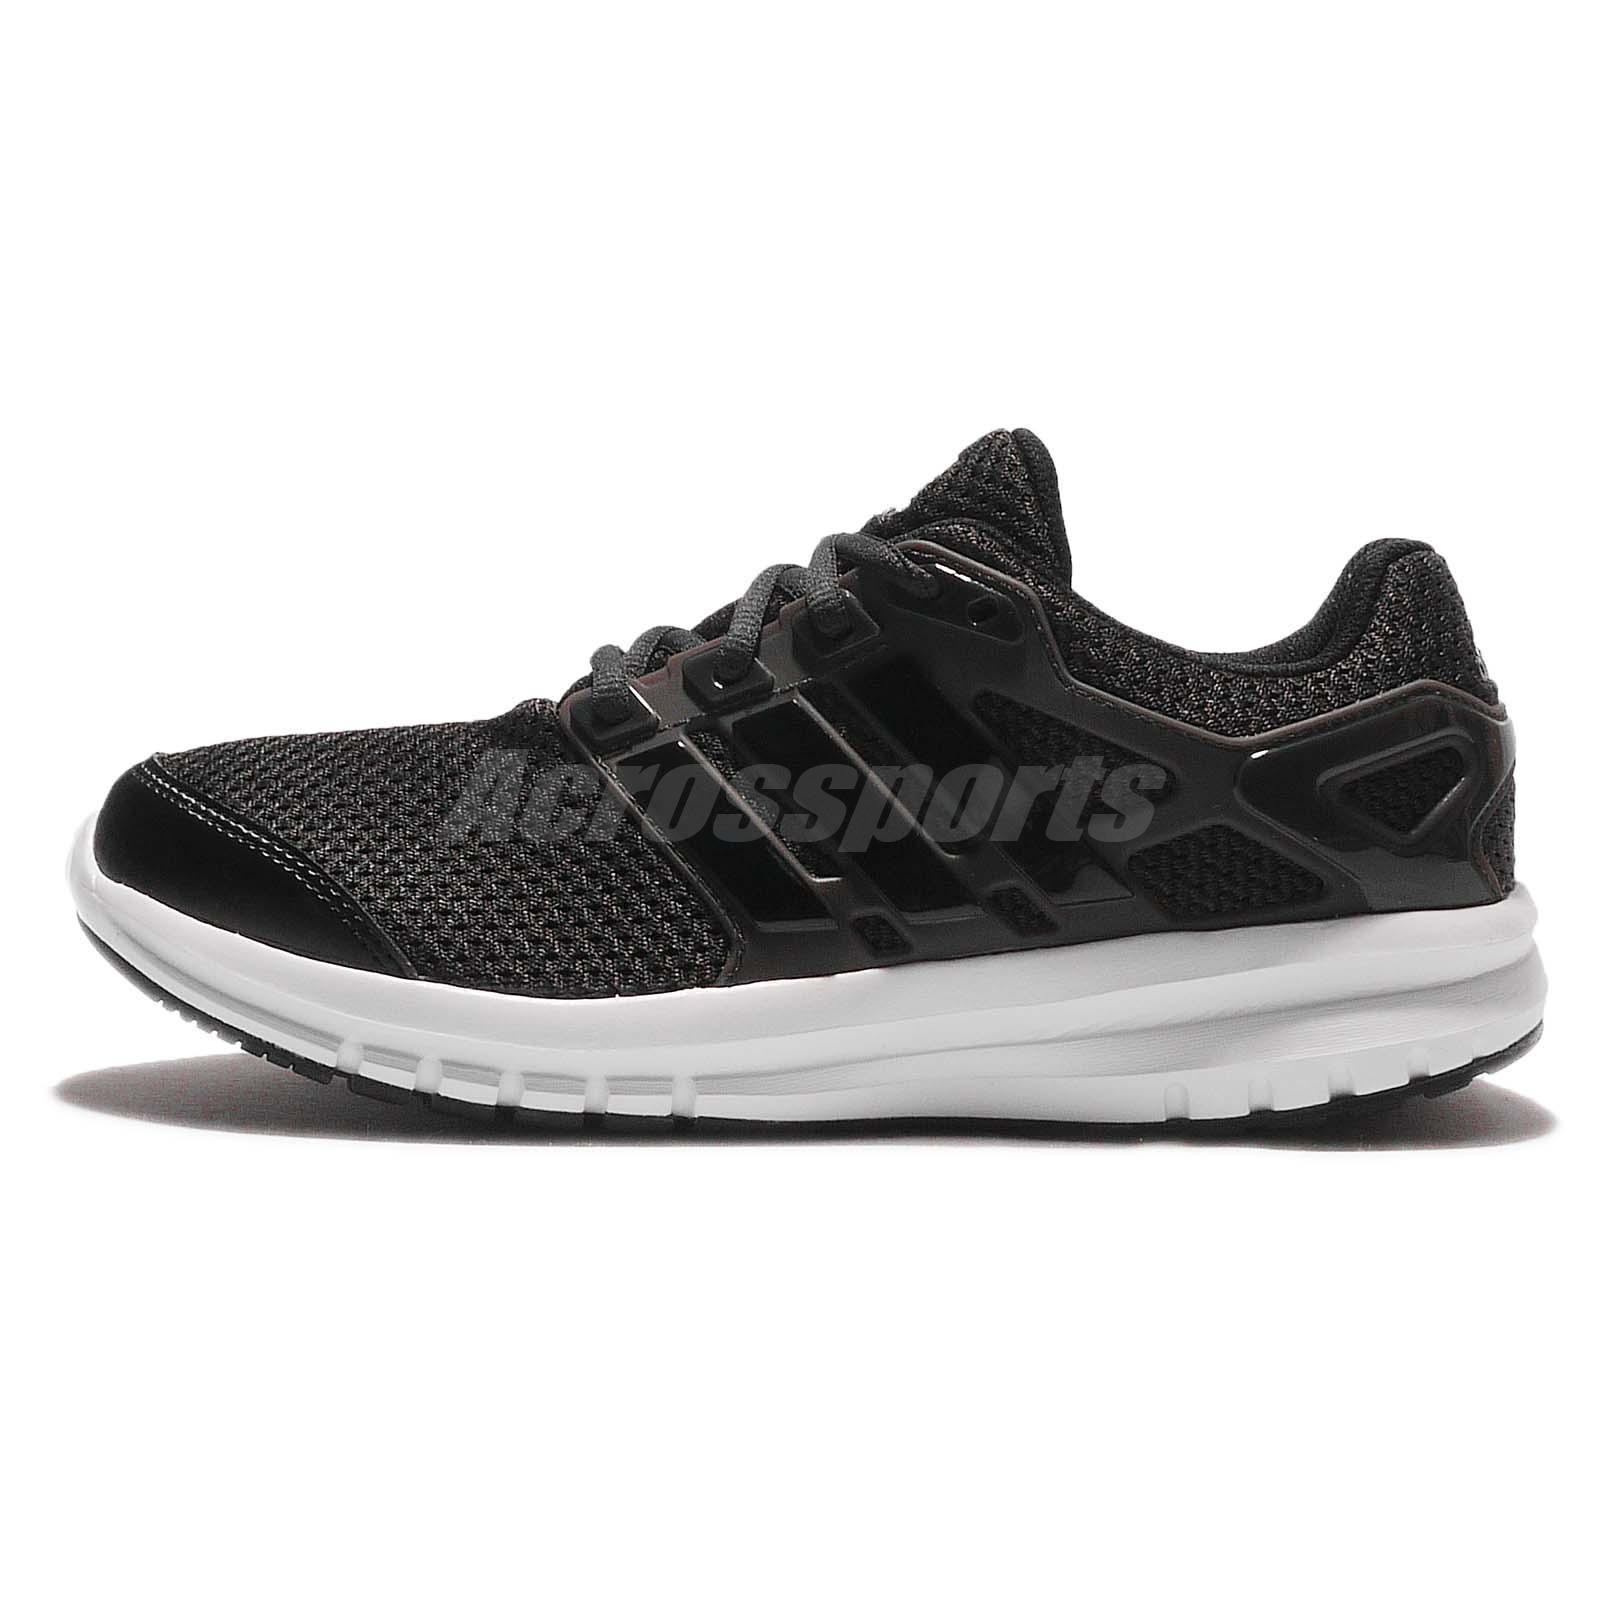 adidas Energy Cloud K Black White Kid Youth Junior Running Shoes Sneakers S79830